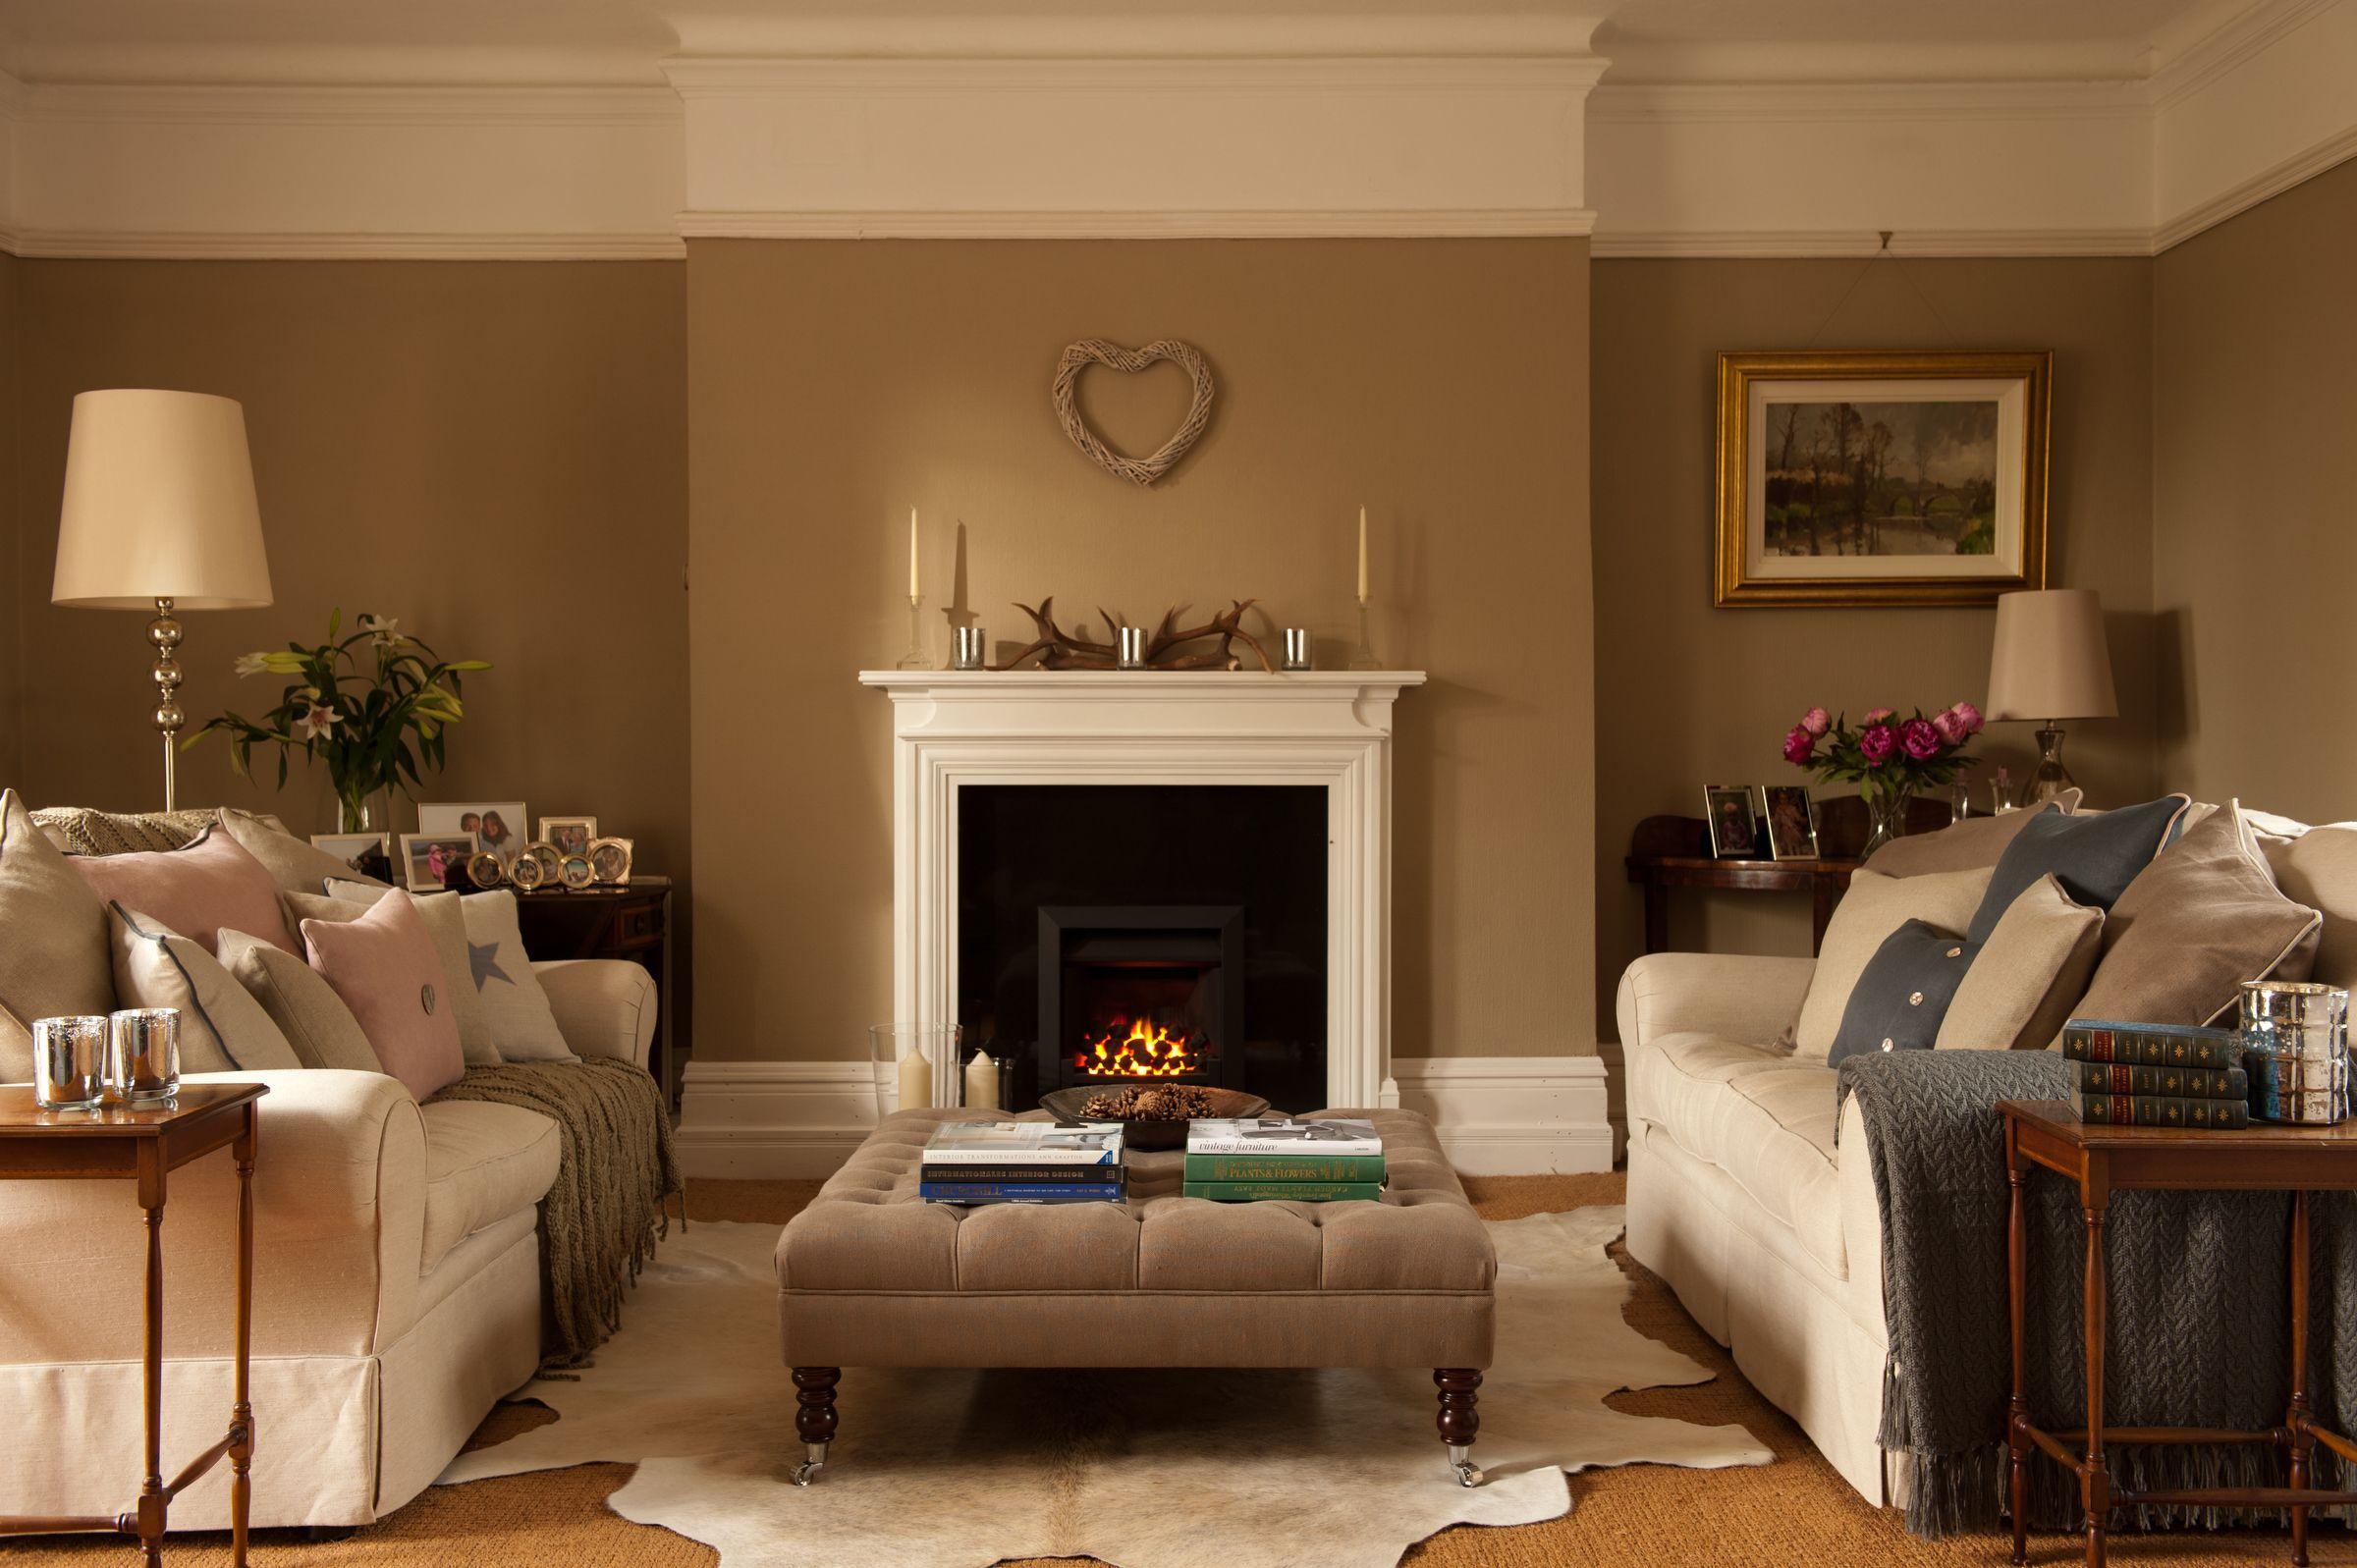 interior design edwardian living room in 2020 | Living ...